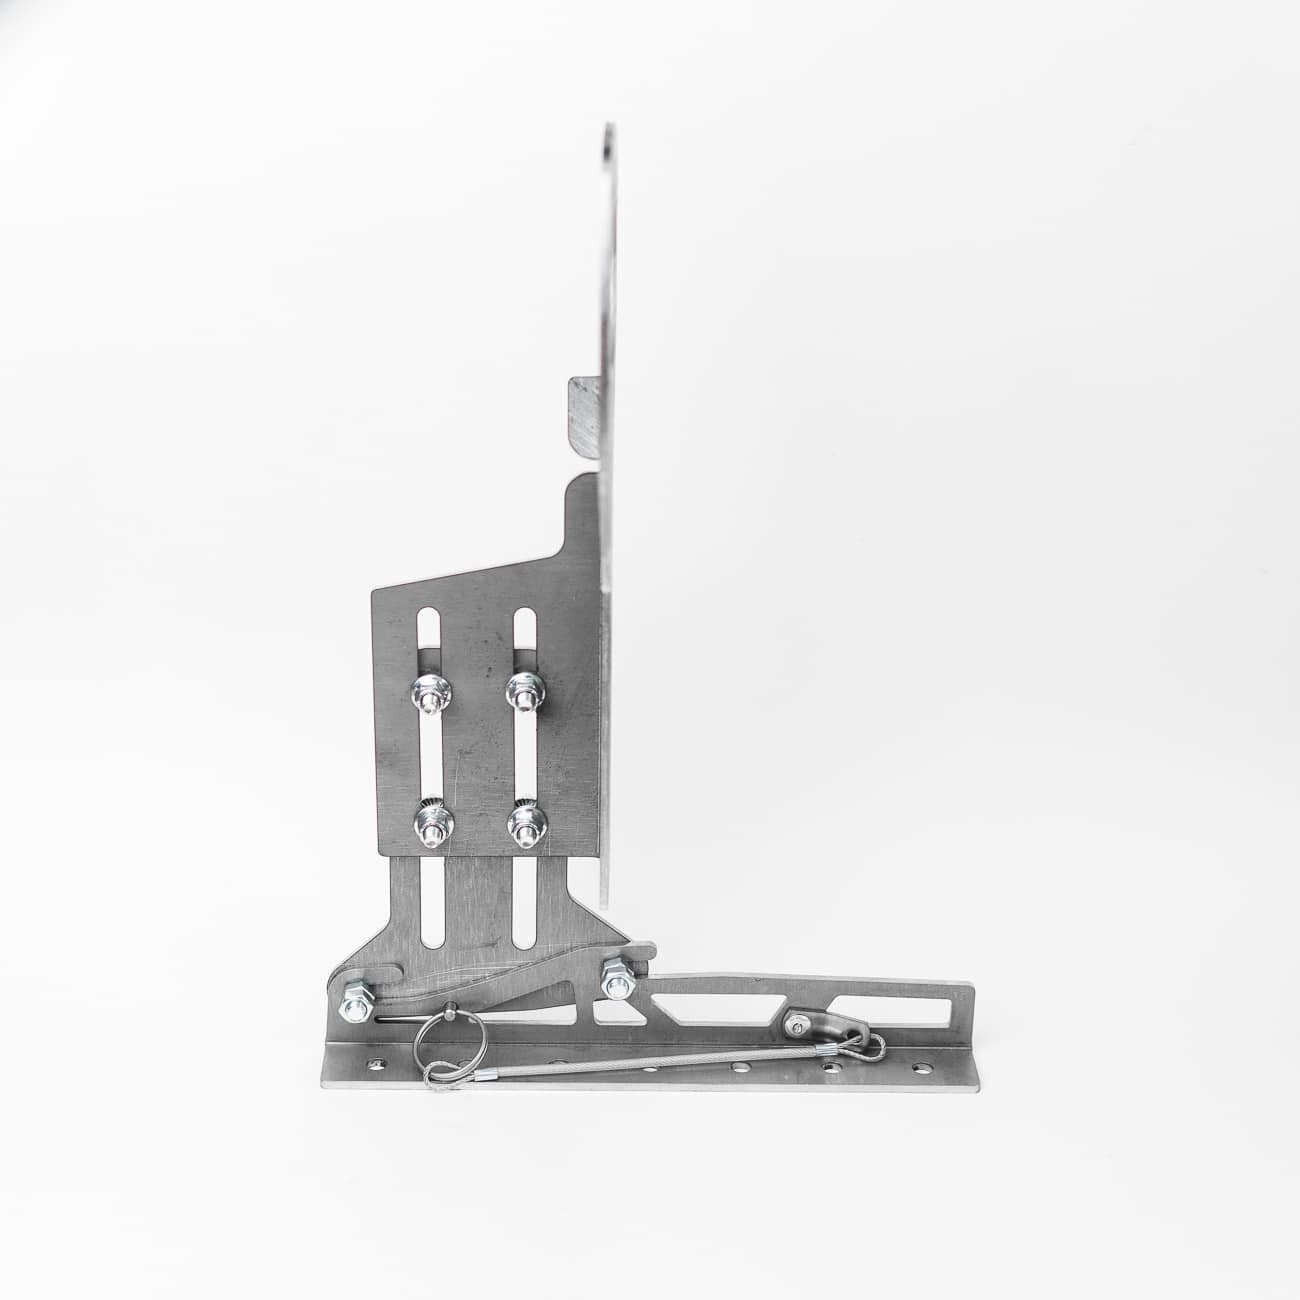 Buildjournal Quick Release Splitter Bracket - E46 M3